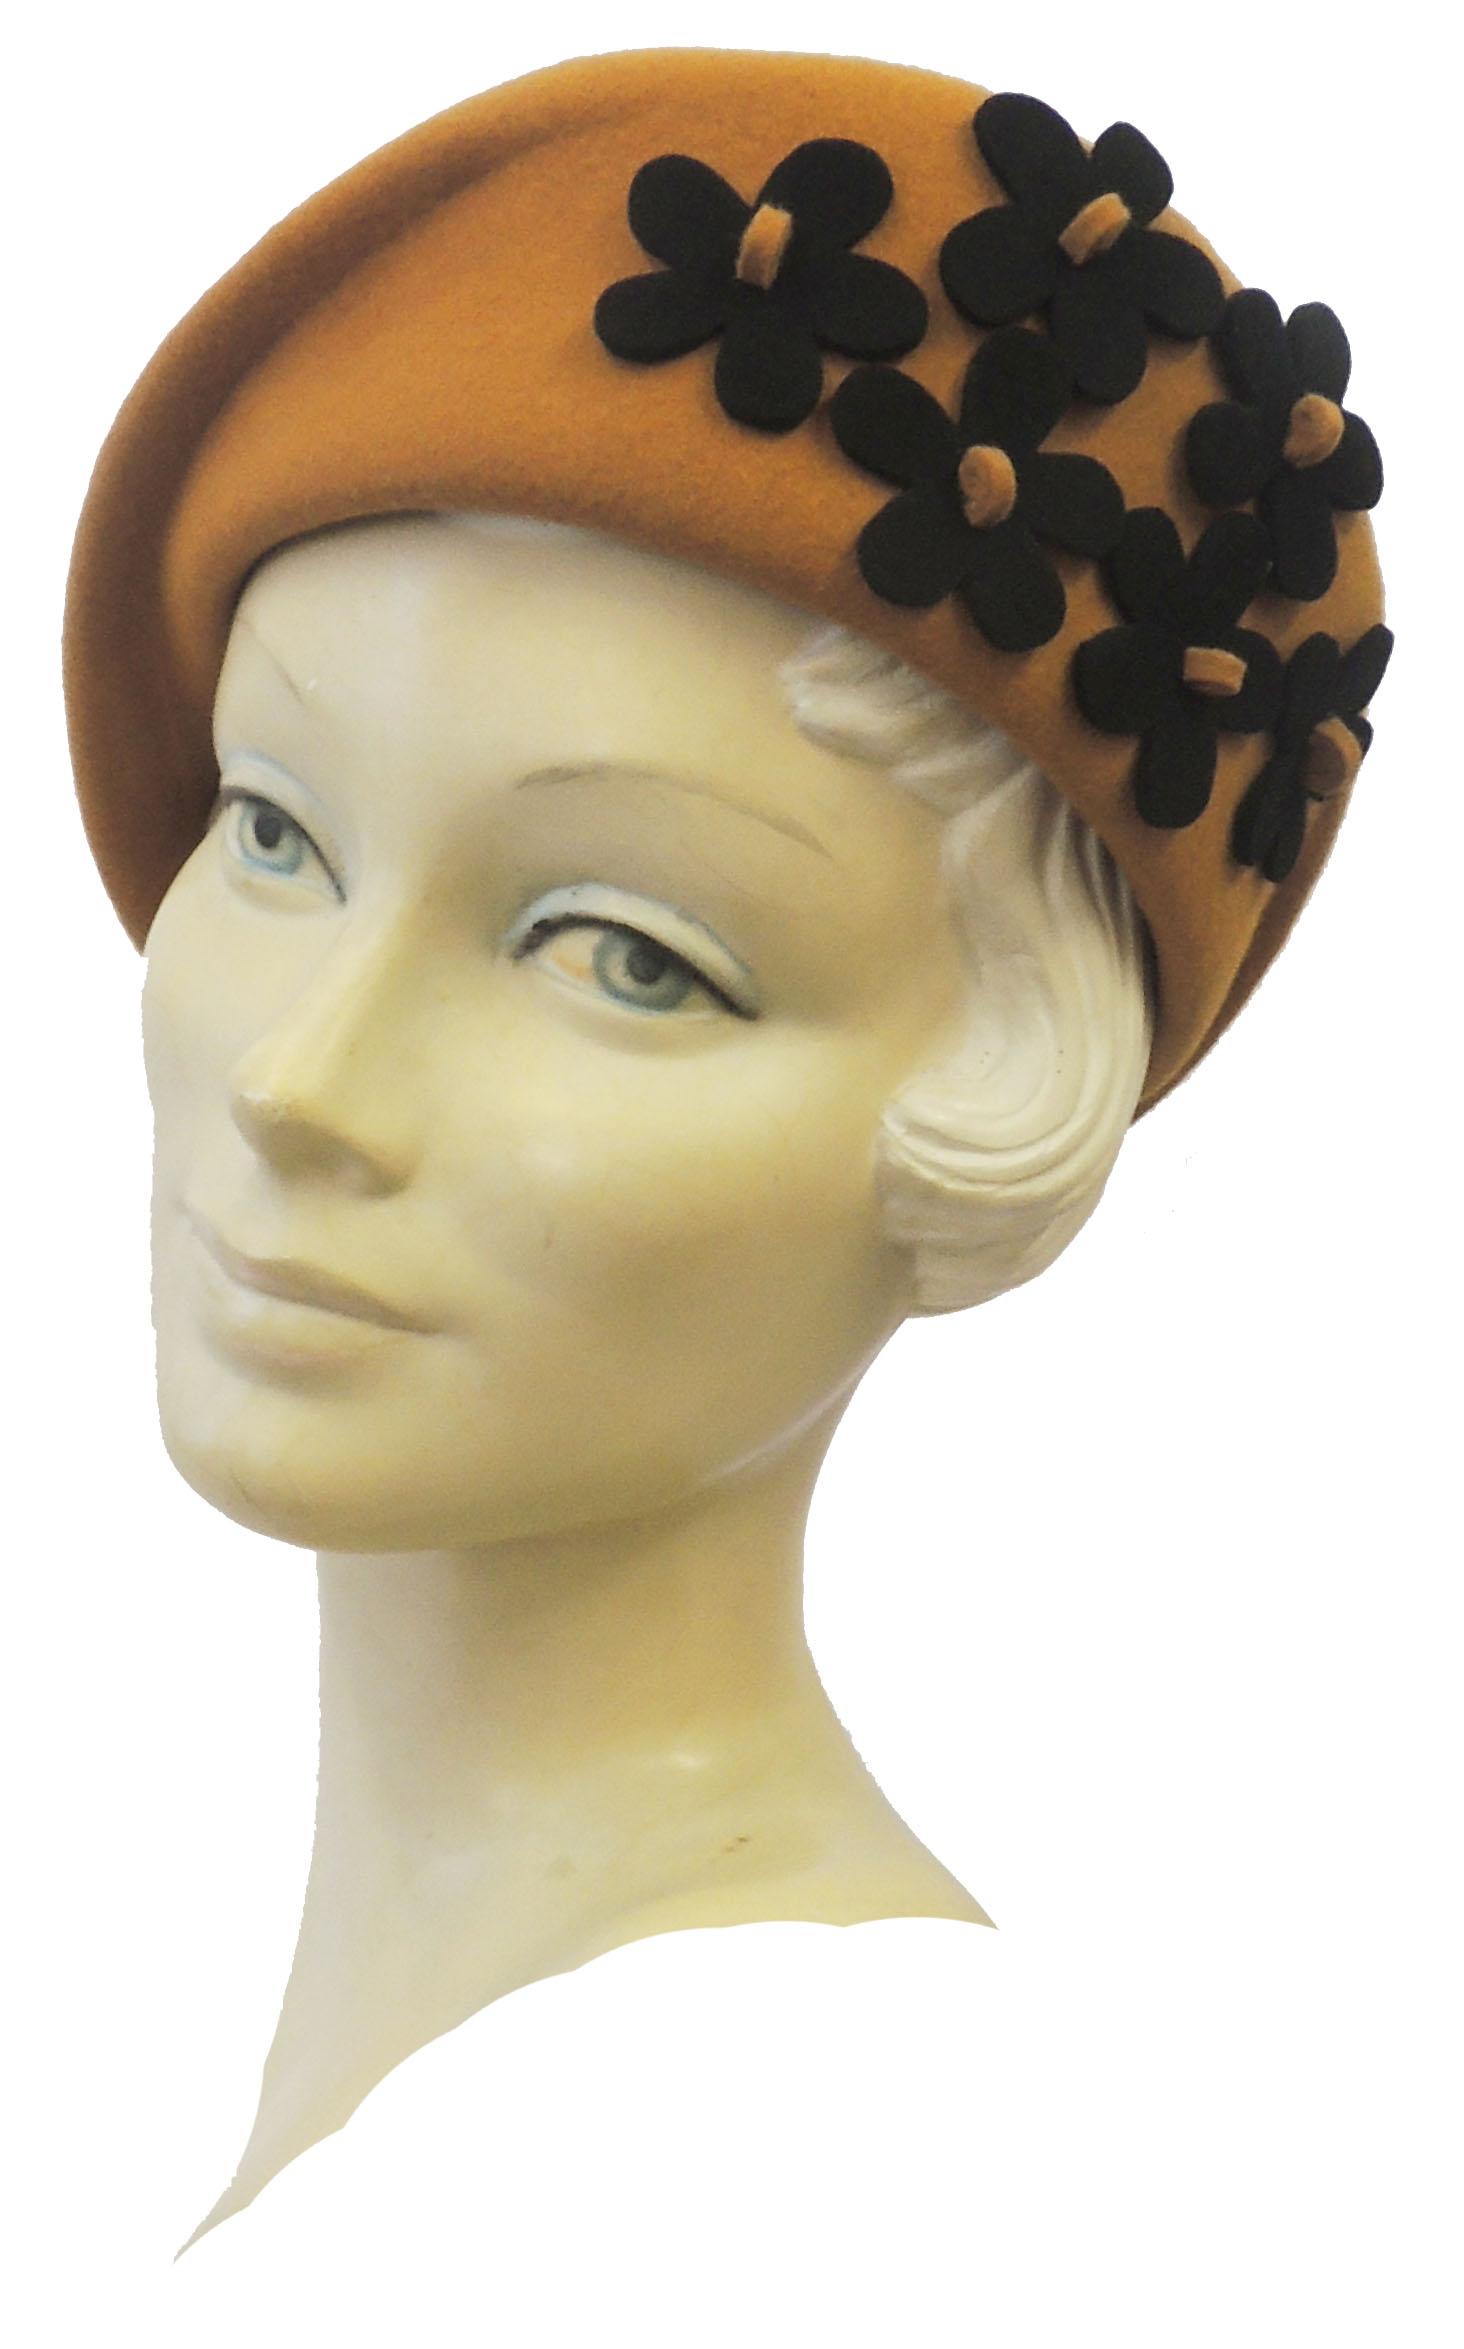 1940s Style Hats 1930's 40's Landgirl WW2 Wartime Felt Flower Cloche Hat $32.99 AT vintagedancer.com